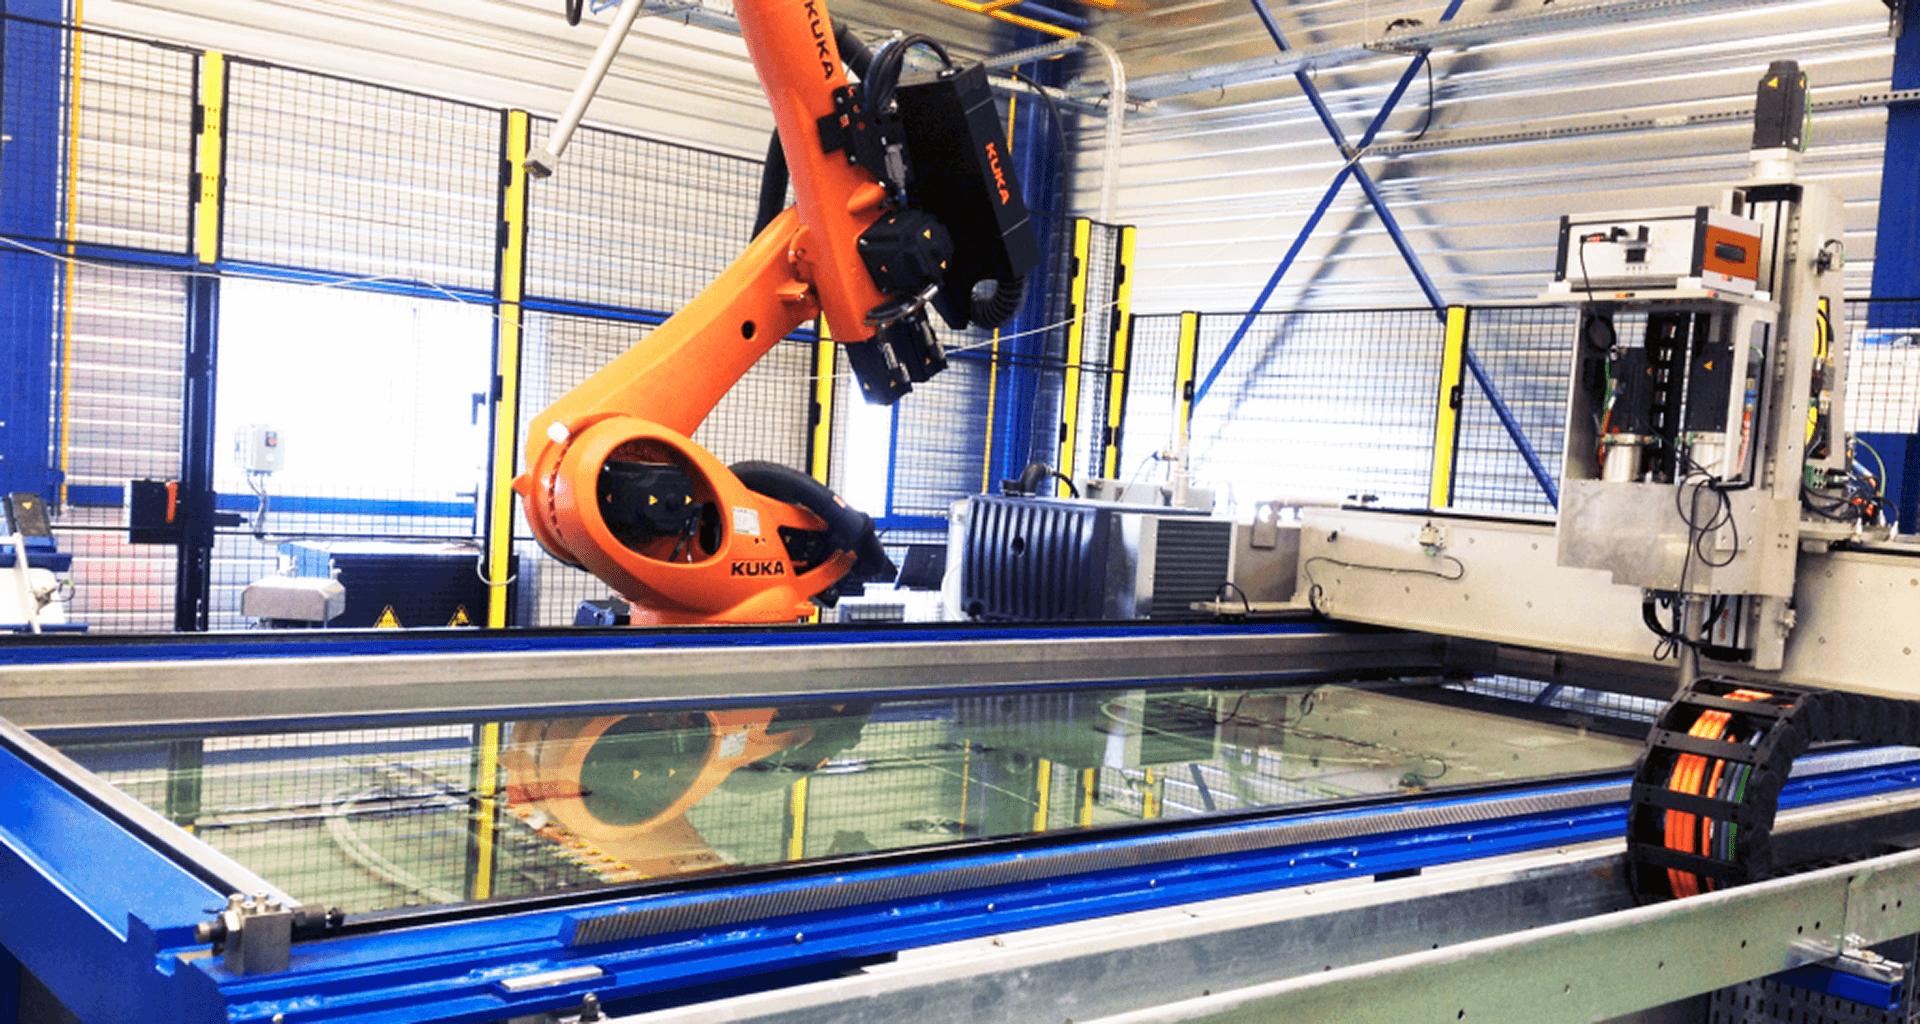 Industrial system for composites inspection using SAUL | Eddyfi